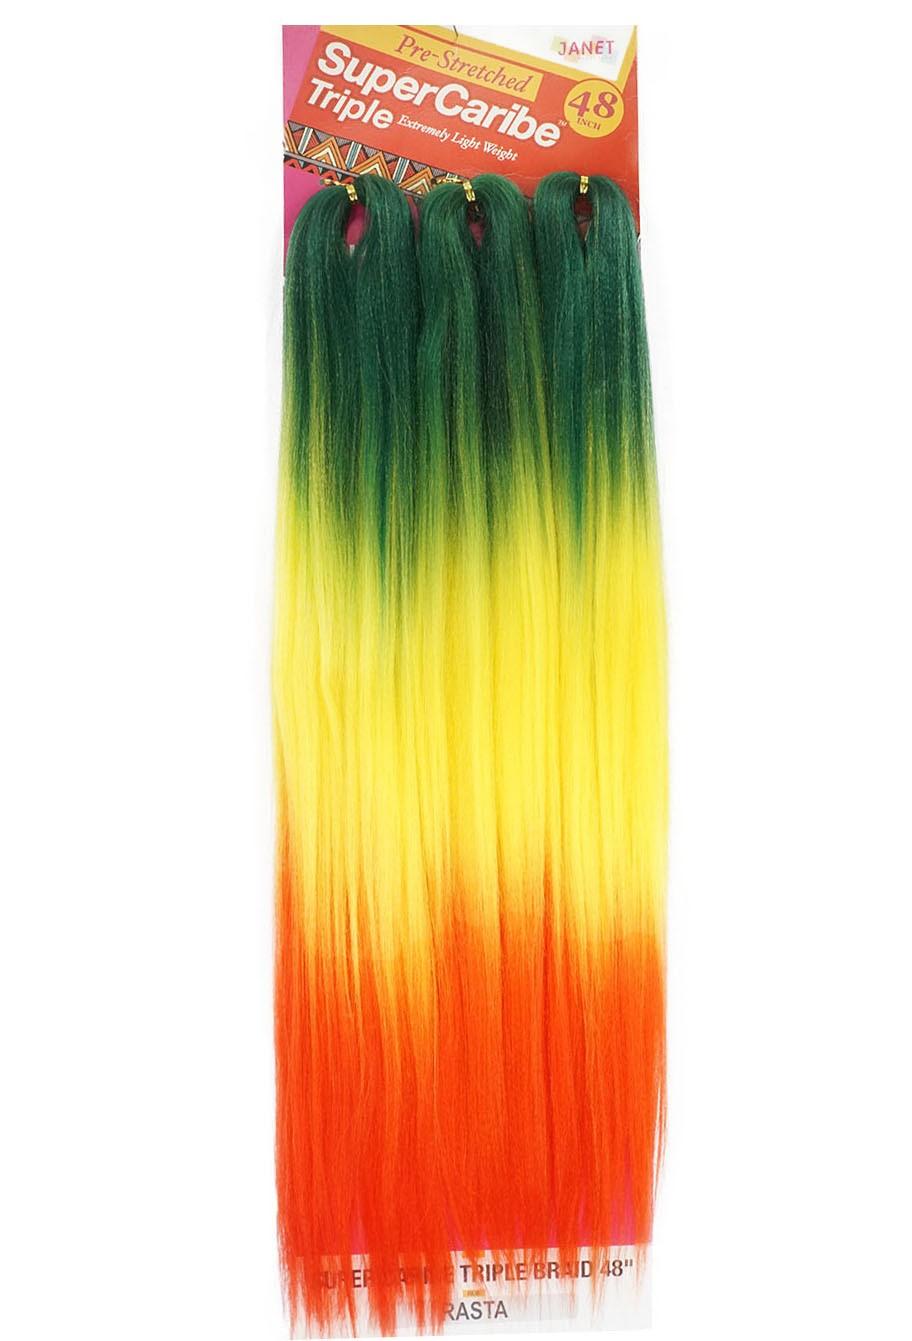 Jumbo Janet - Super Caribe Triple - Cor: Verde / Amarelo / Vermelho